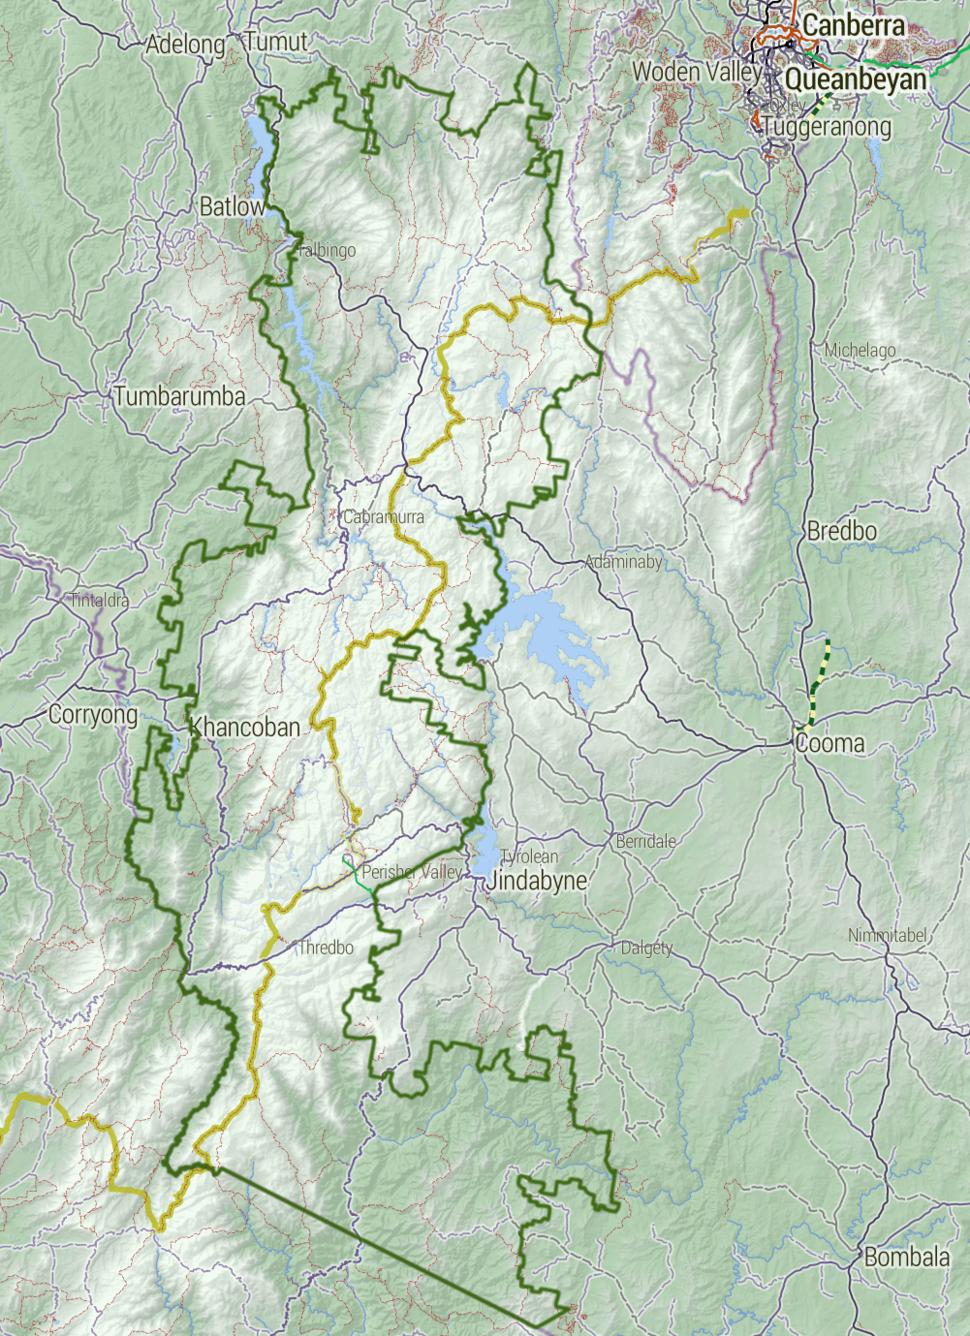 Kosciuszko National Park map Stevage